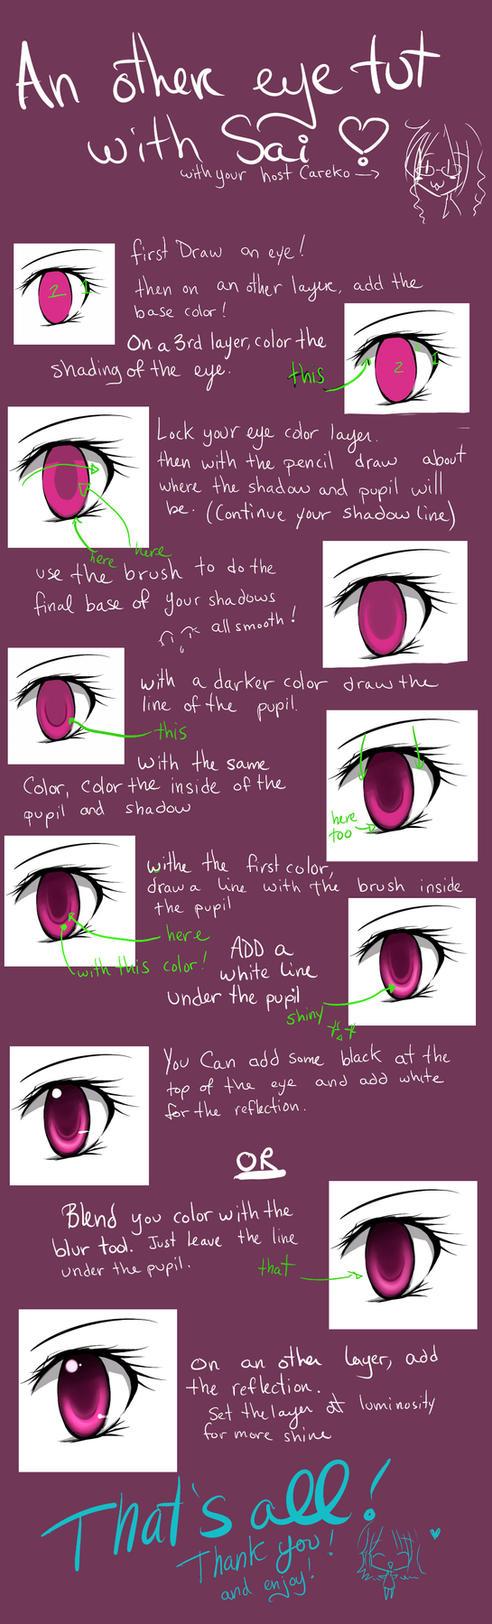 Another eye tutorial in SAI by careko